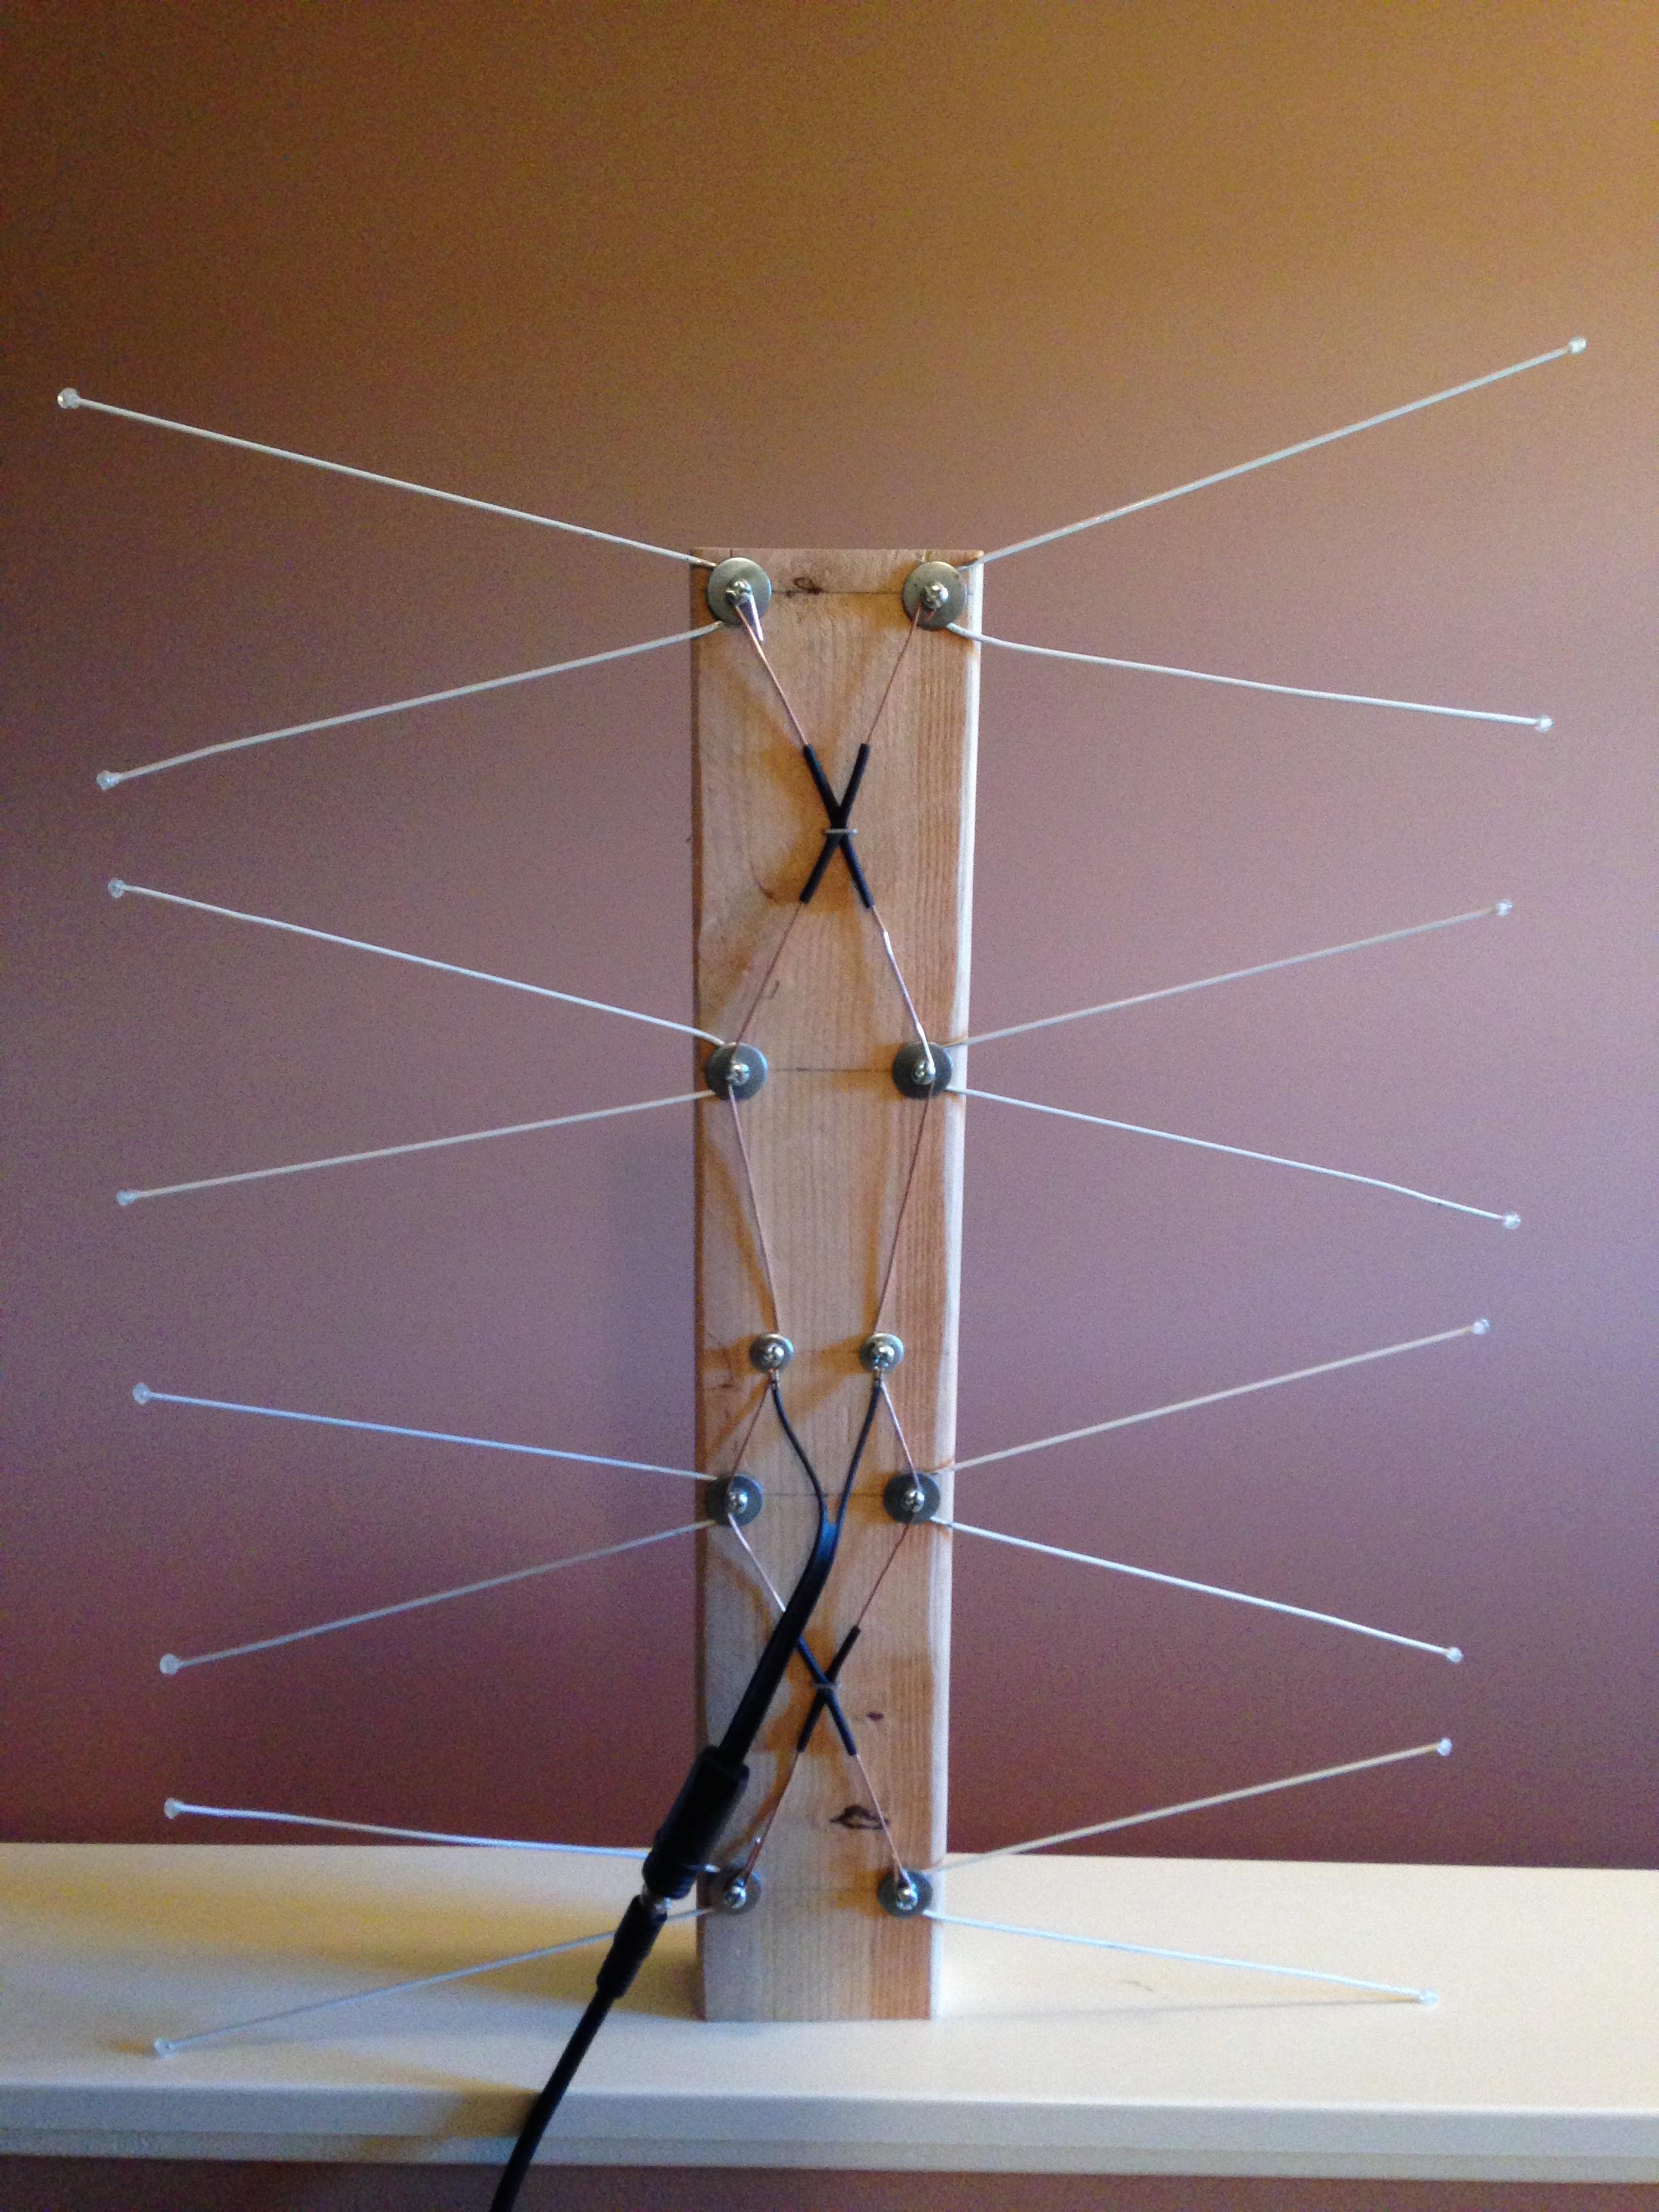 Hdtv Antenna Diy Coat Hanger | Crafting